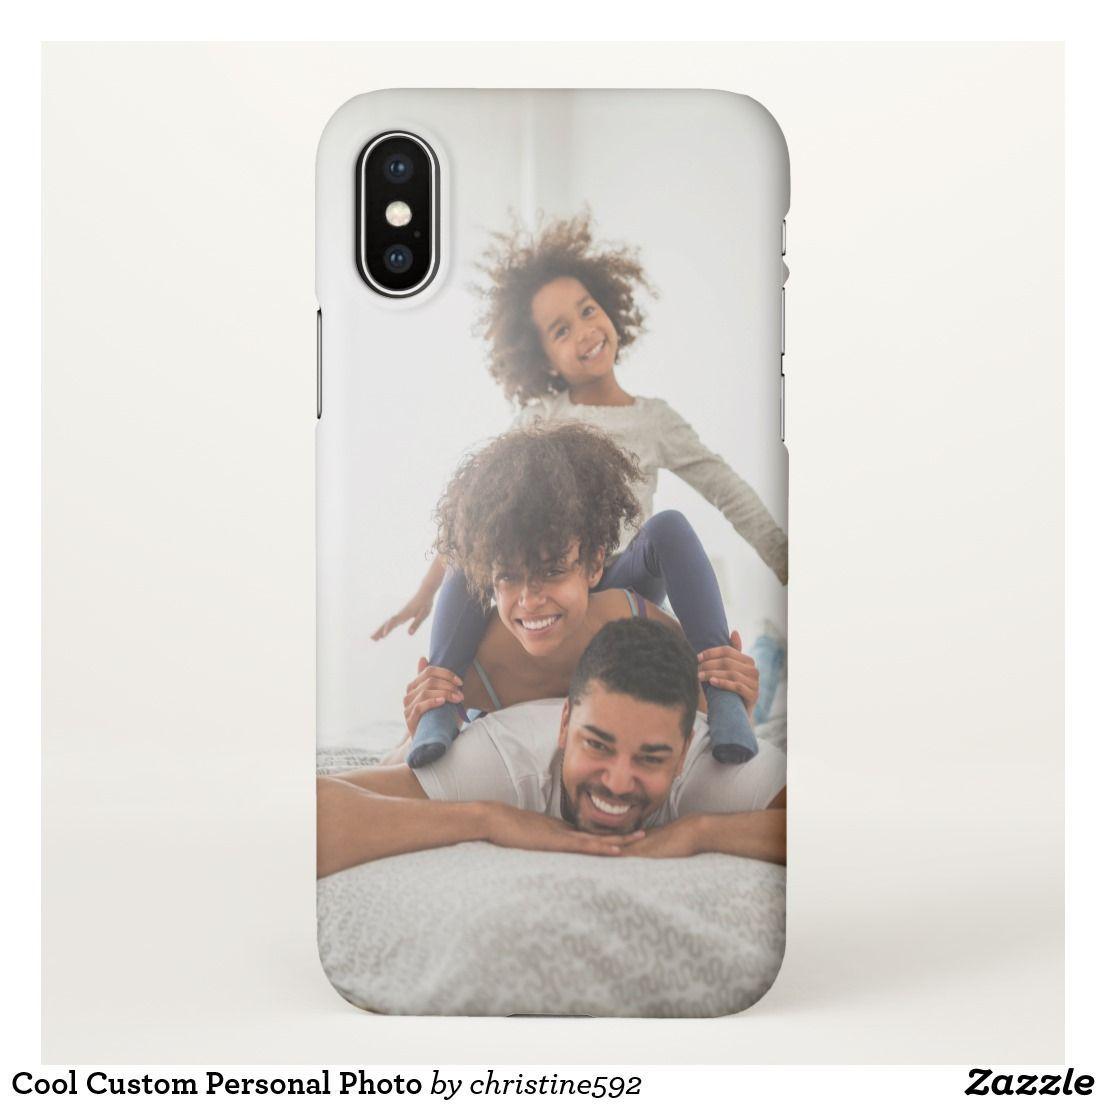 Cool Custom Personal Photo Iphone X Case Iphone Datenubertragung Netzteile